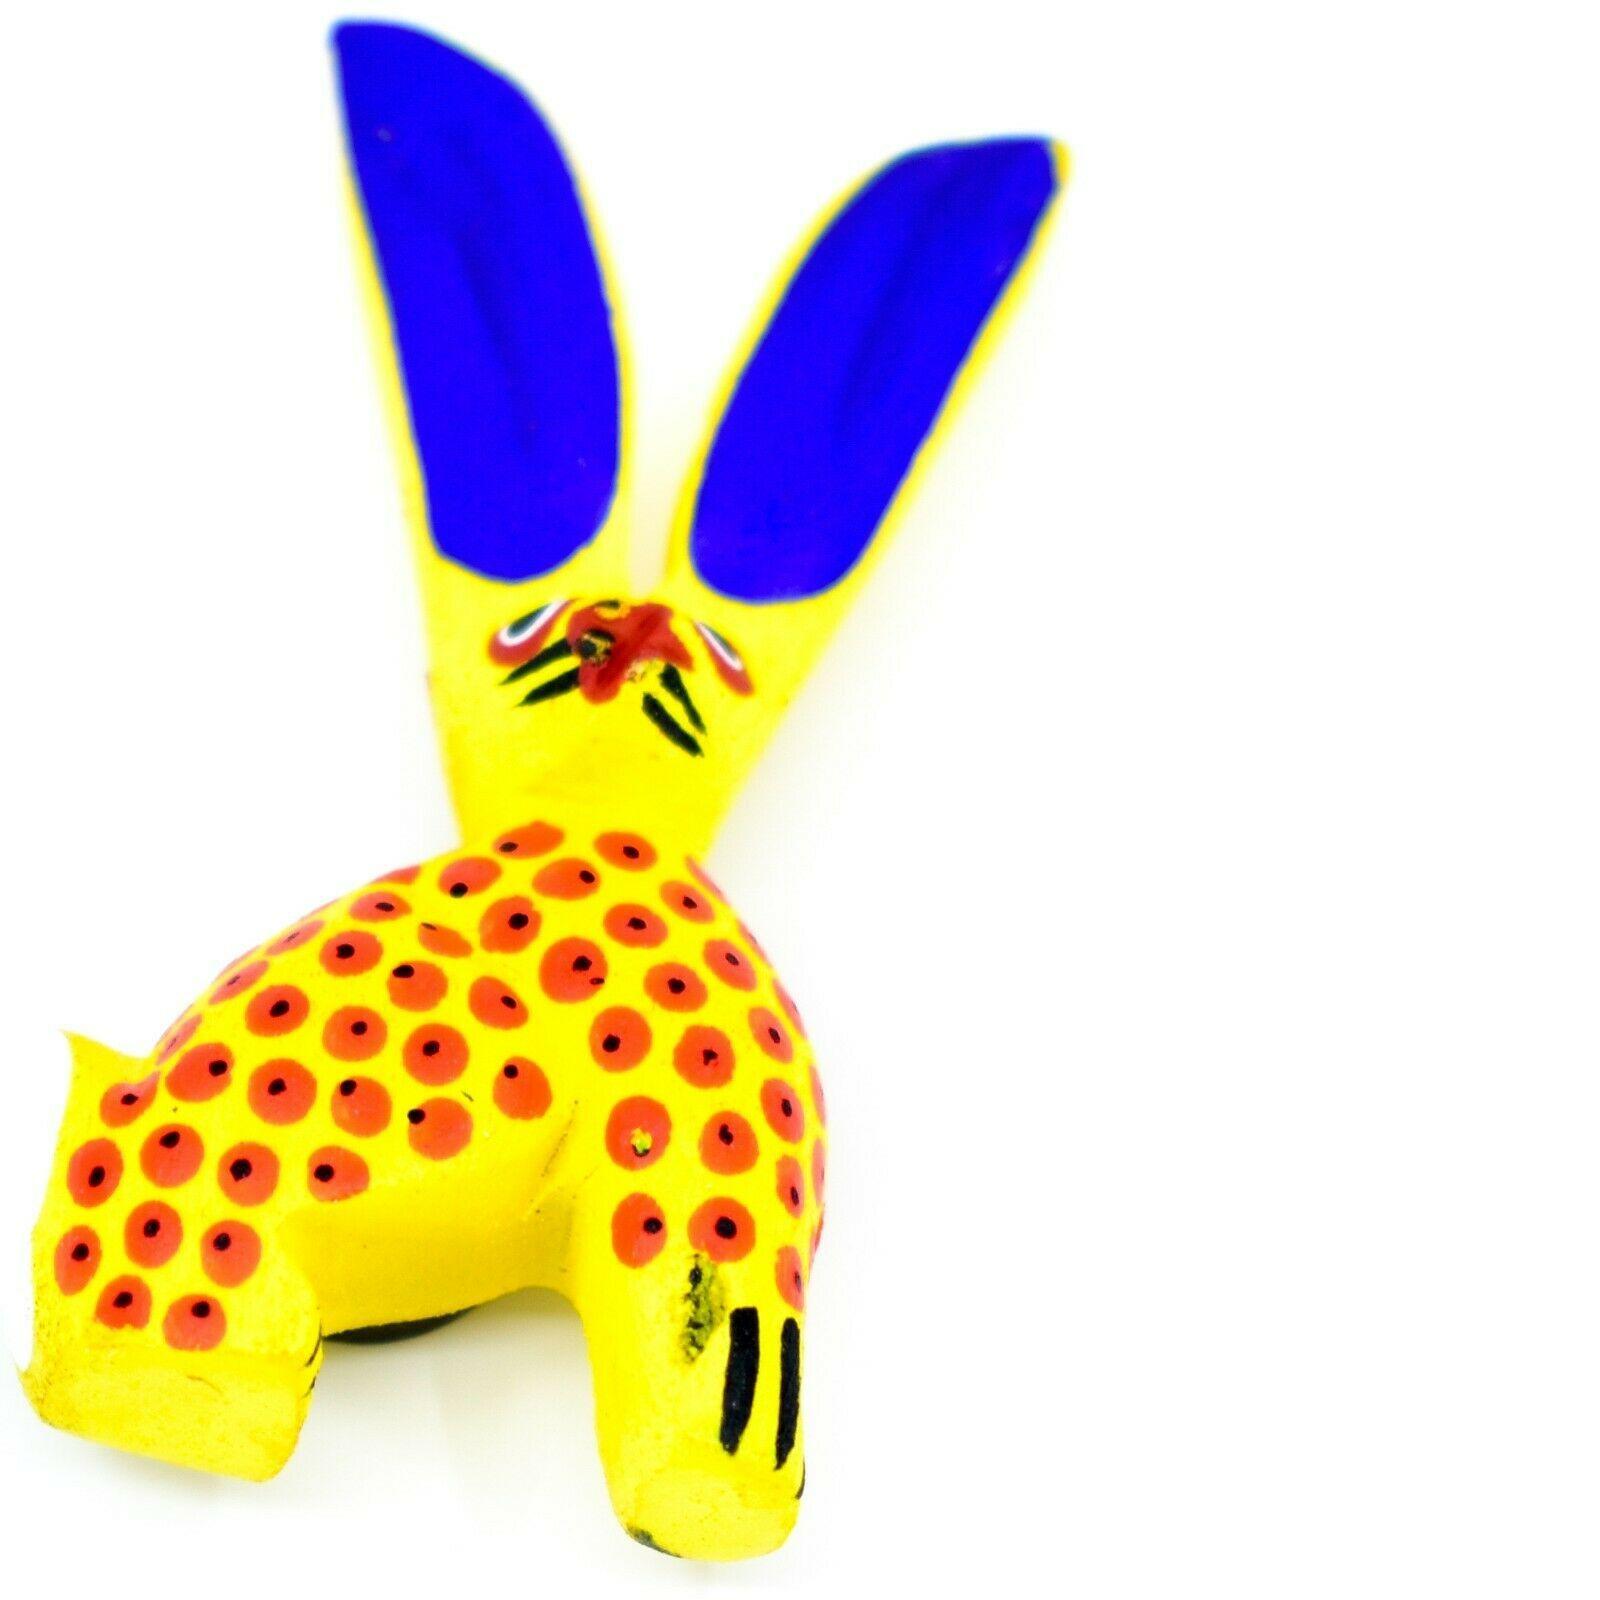 Handmade Alebrijes Oaxacan Wood Carved Folk Art Rabbit Magnet